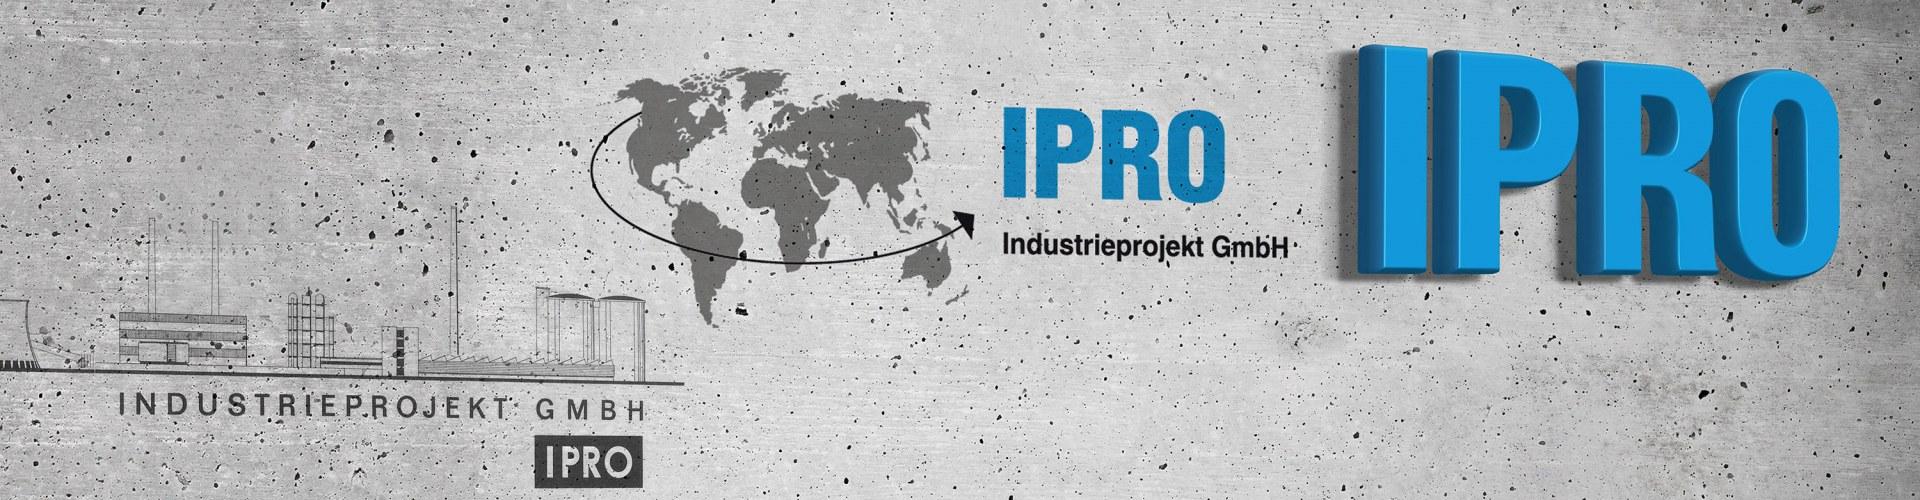 IPRO Ingenieurbüro Logo Historie